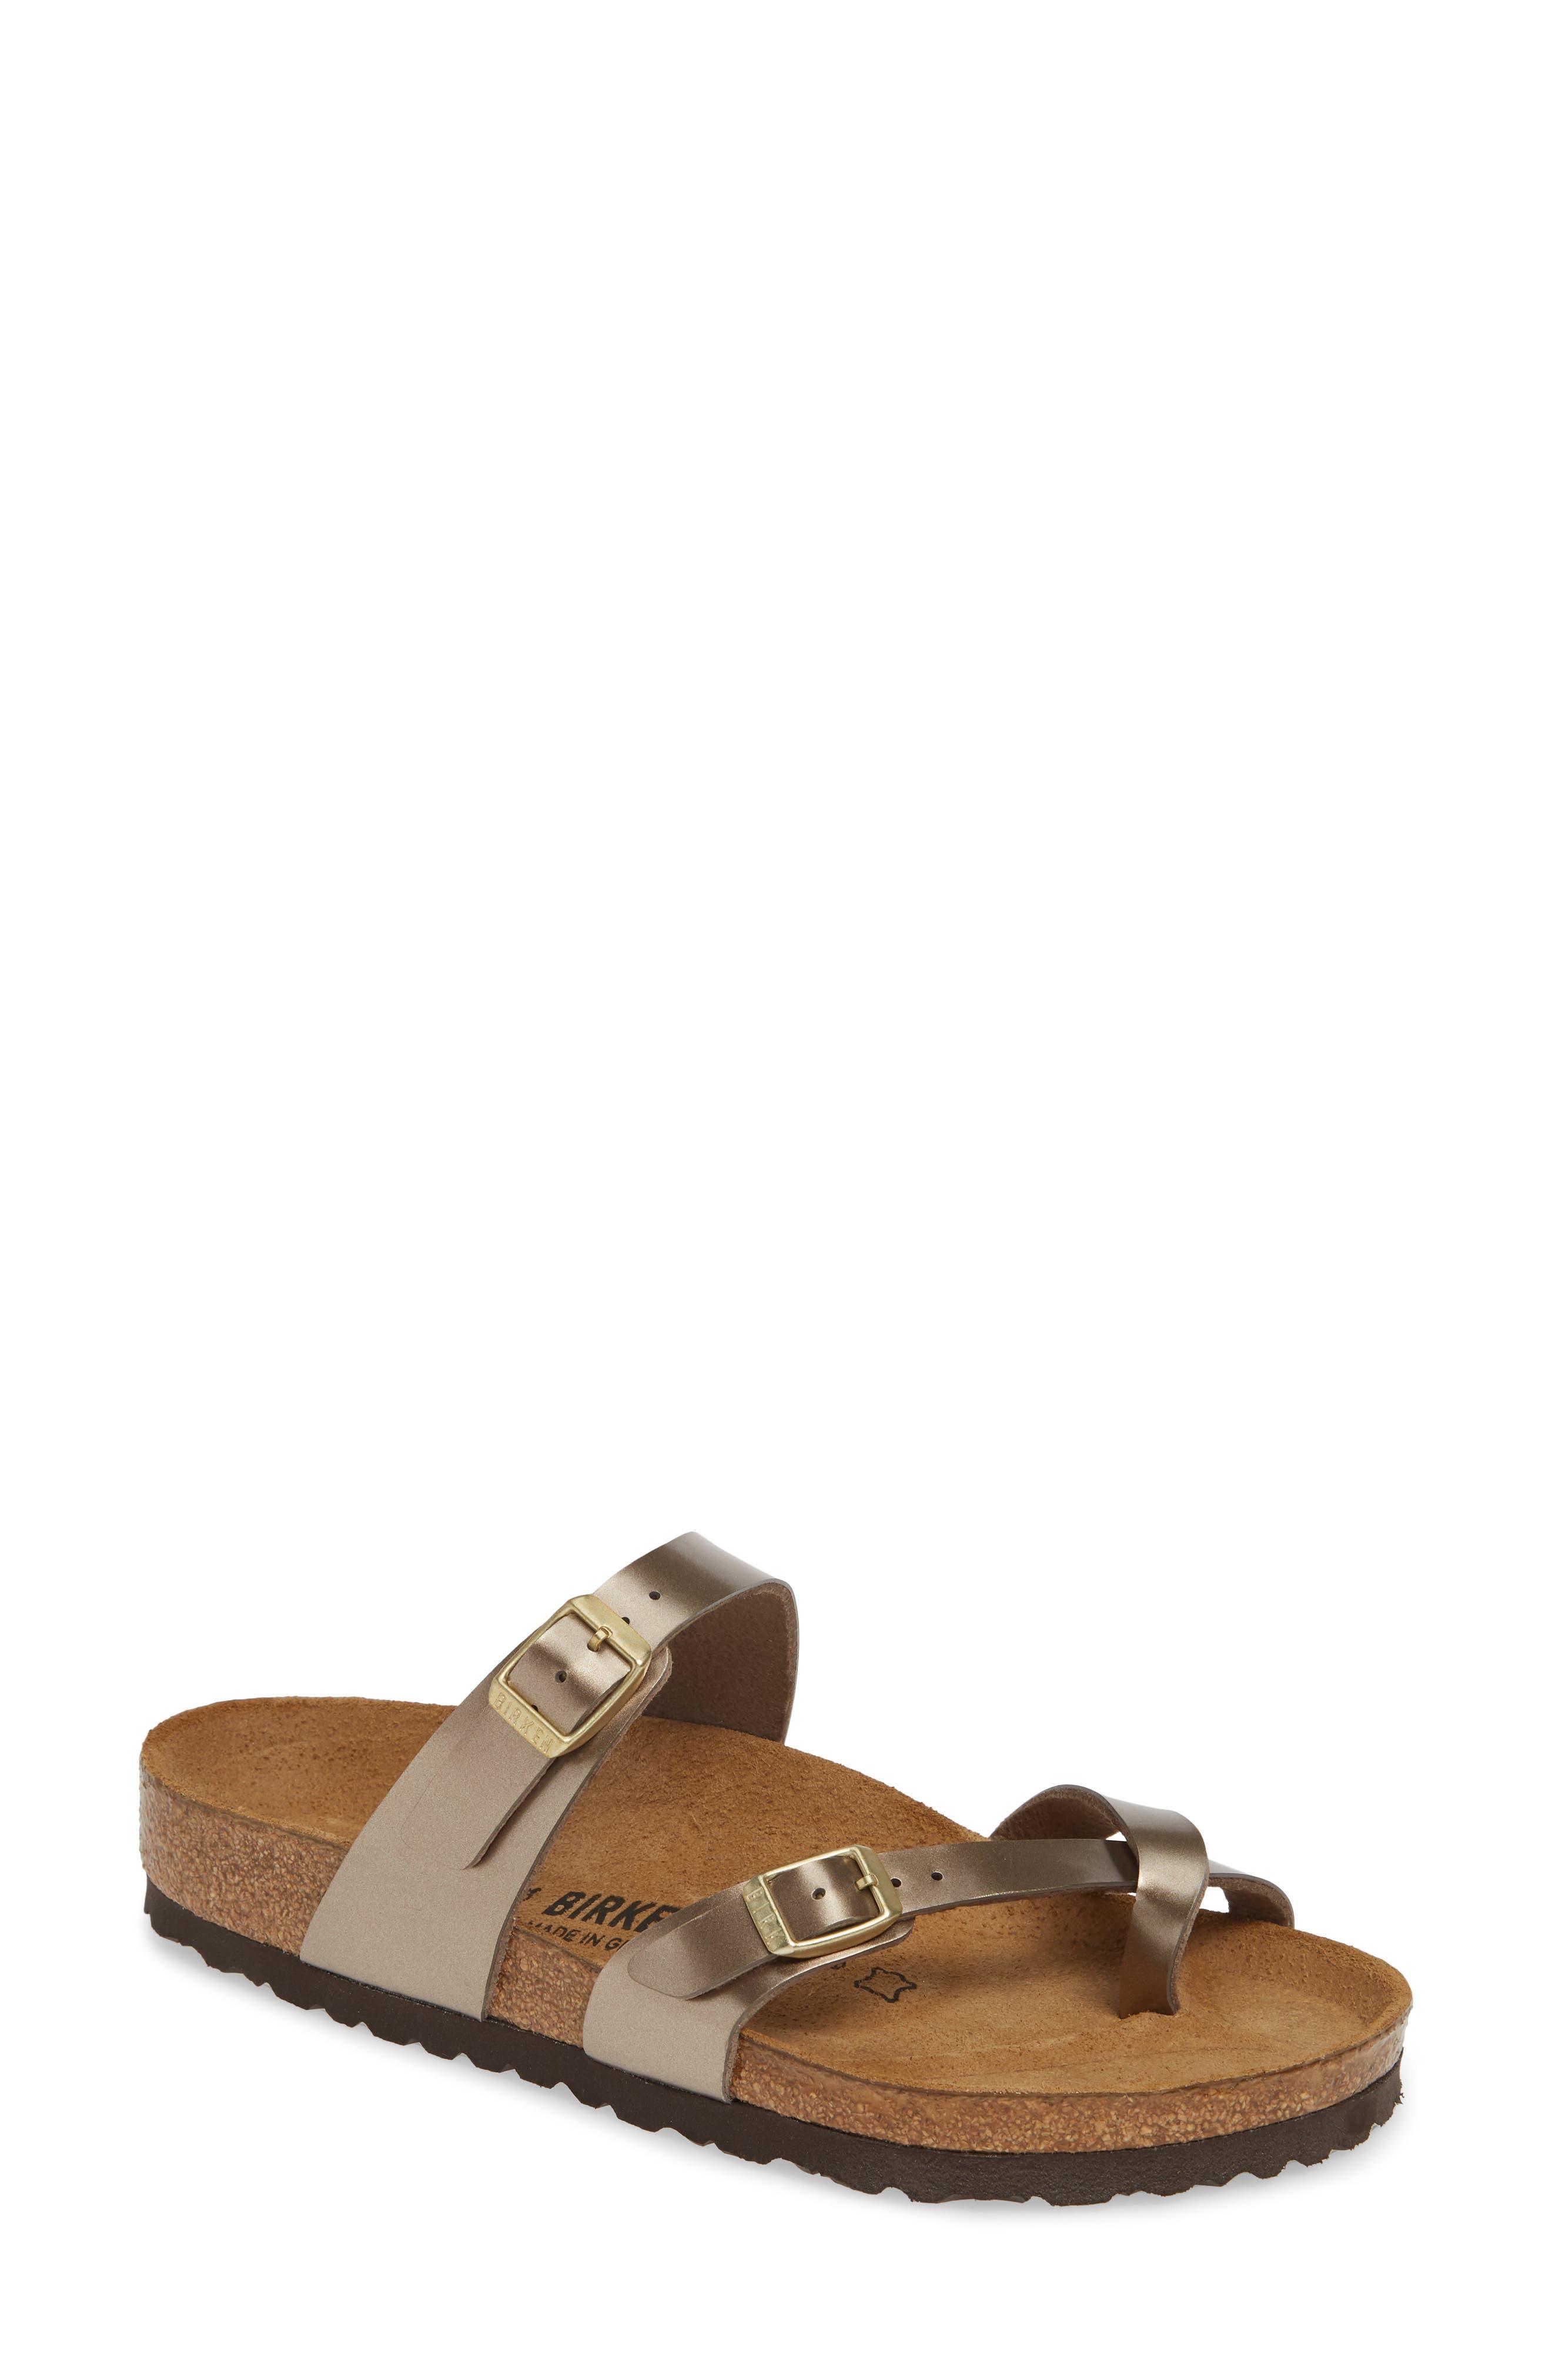 Birkenstock Mayari Slide Sandal,5.5 - Beige